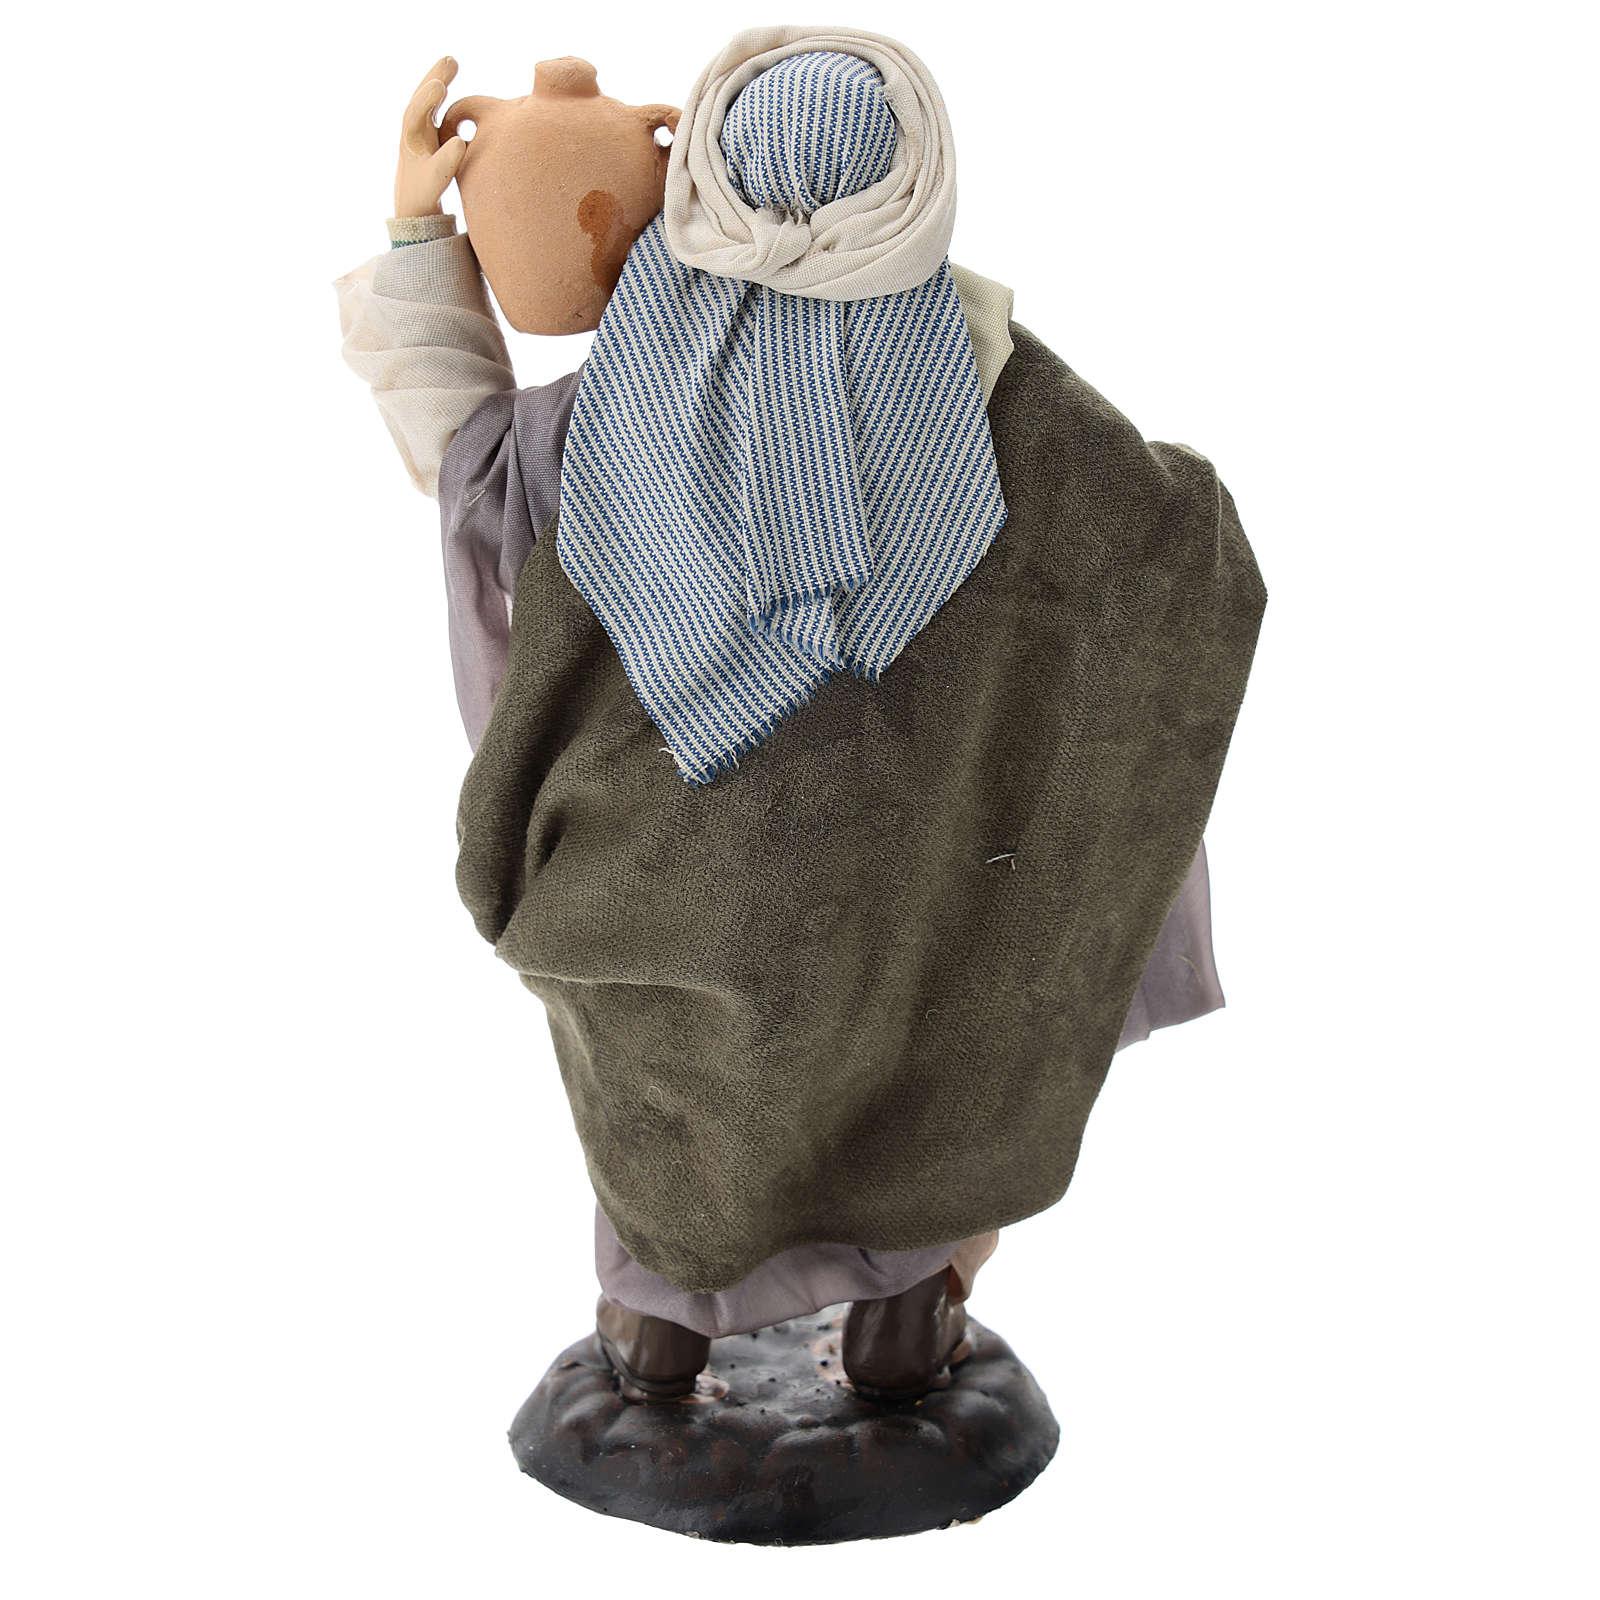 Neapolitan Nativity figurine, man with amphora, 18 cm 4